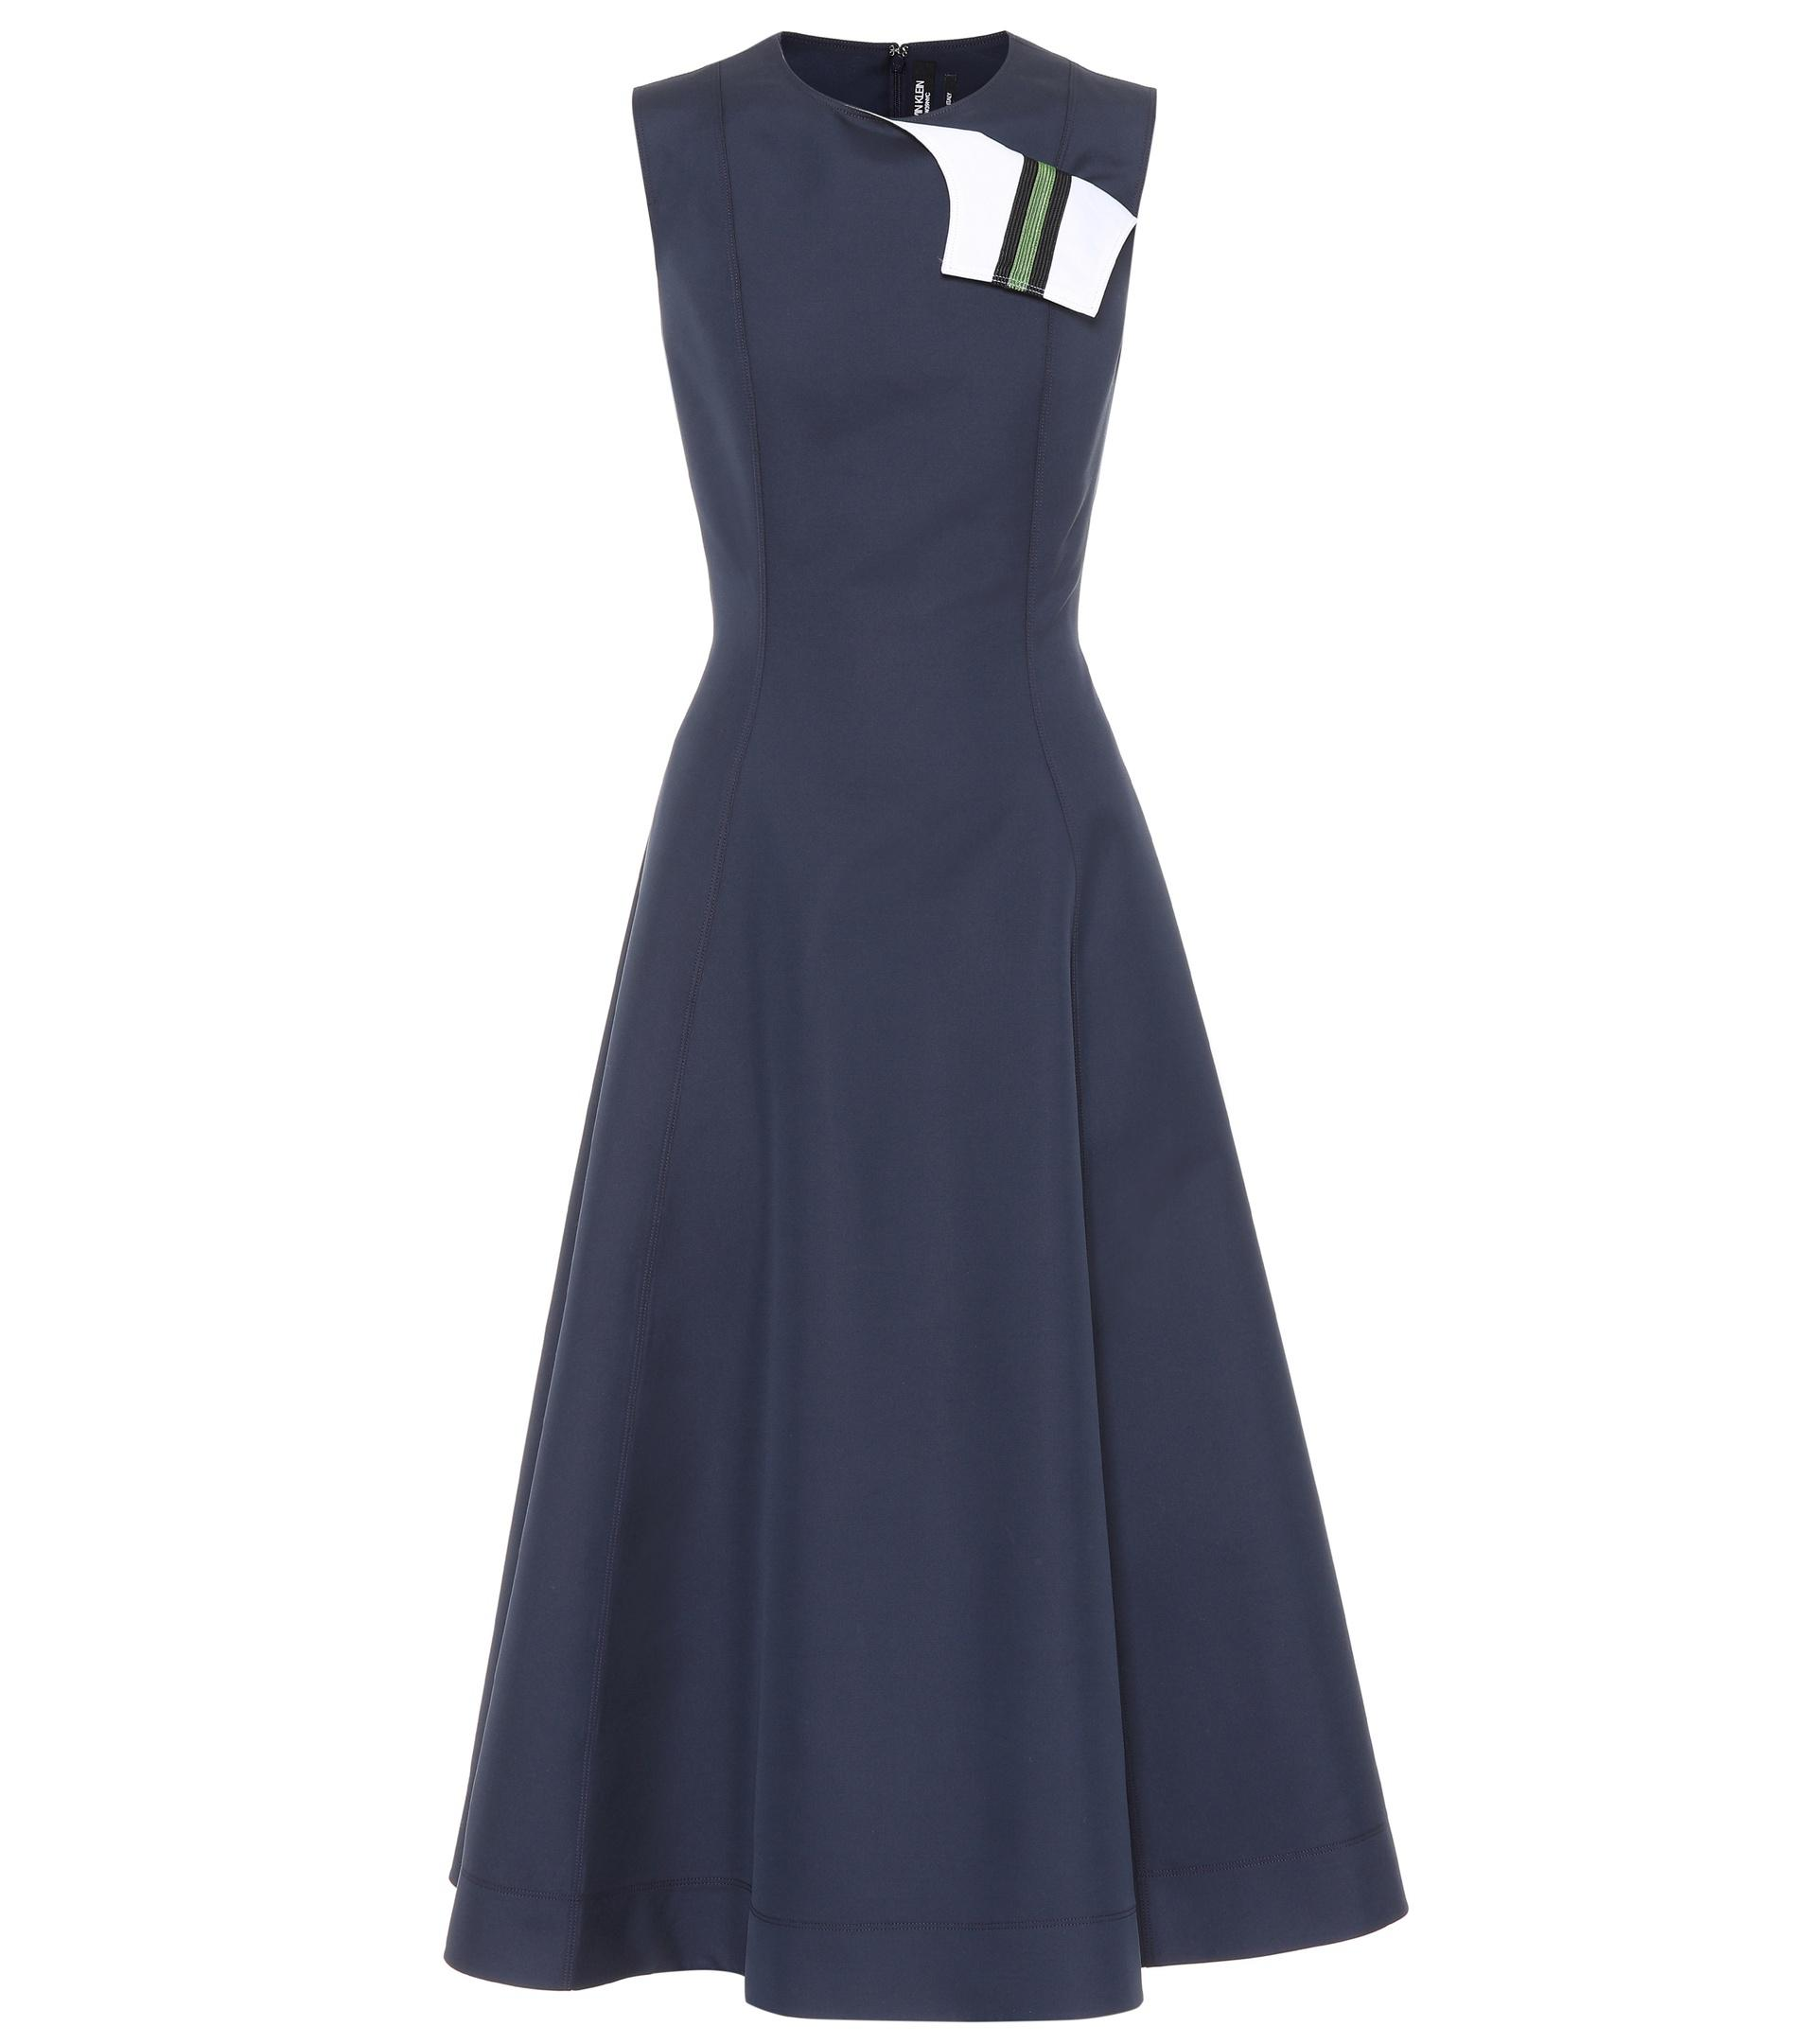 Cotton and silk A-line dress CALVIN KLEIN 205W39NYC NTojp4